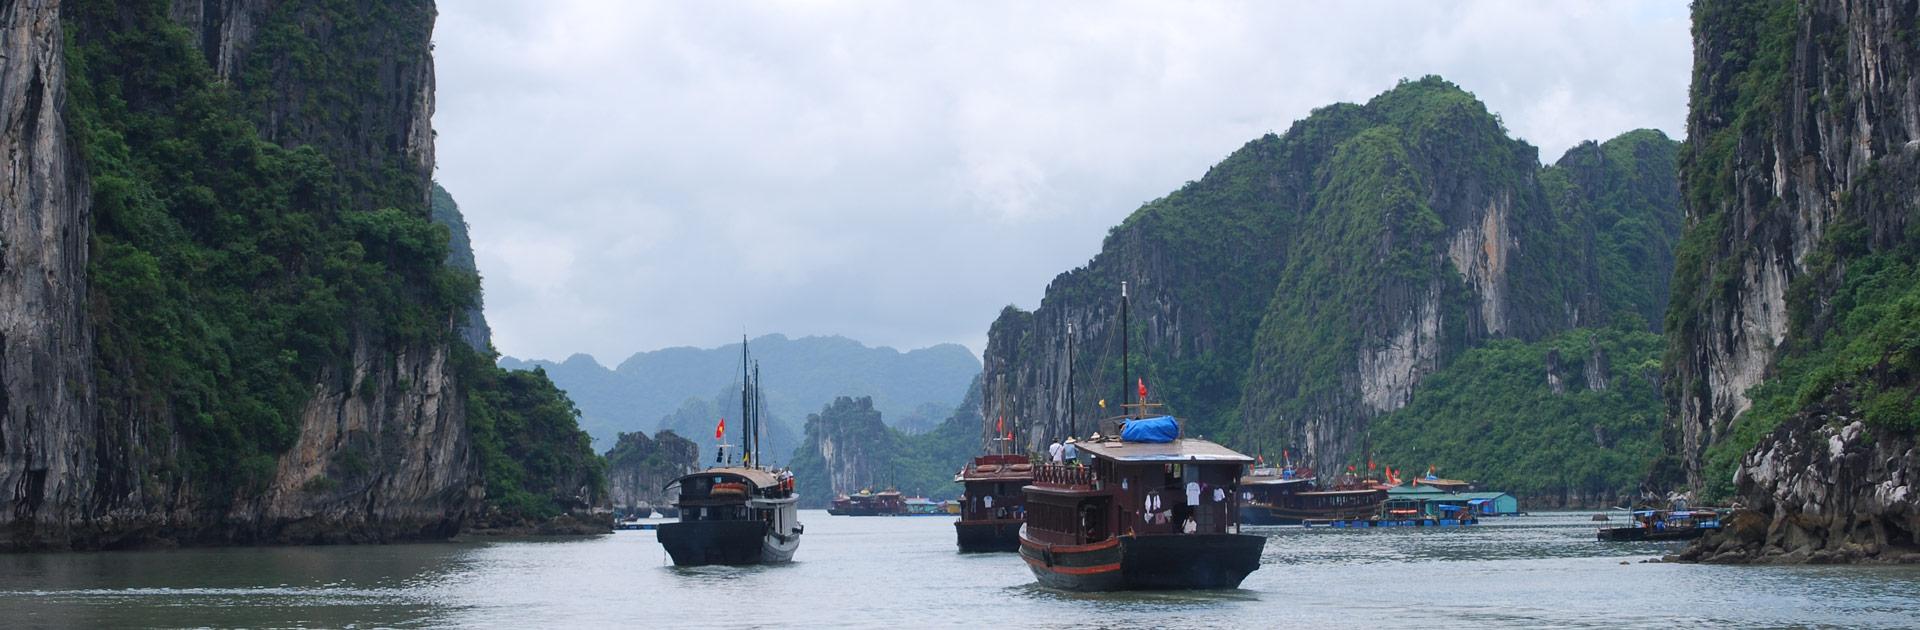 VN Encantos de Vietnam 11 días 1